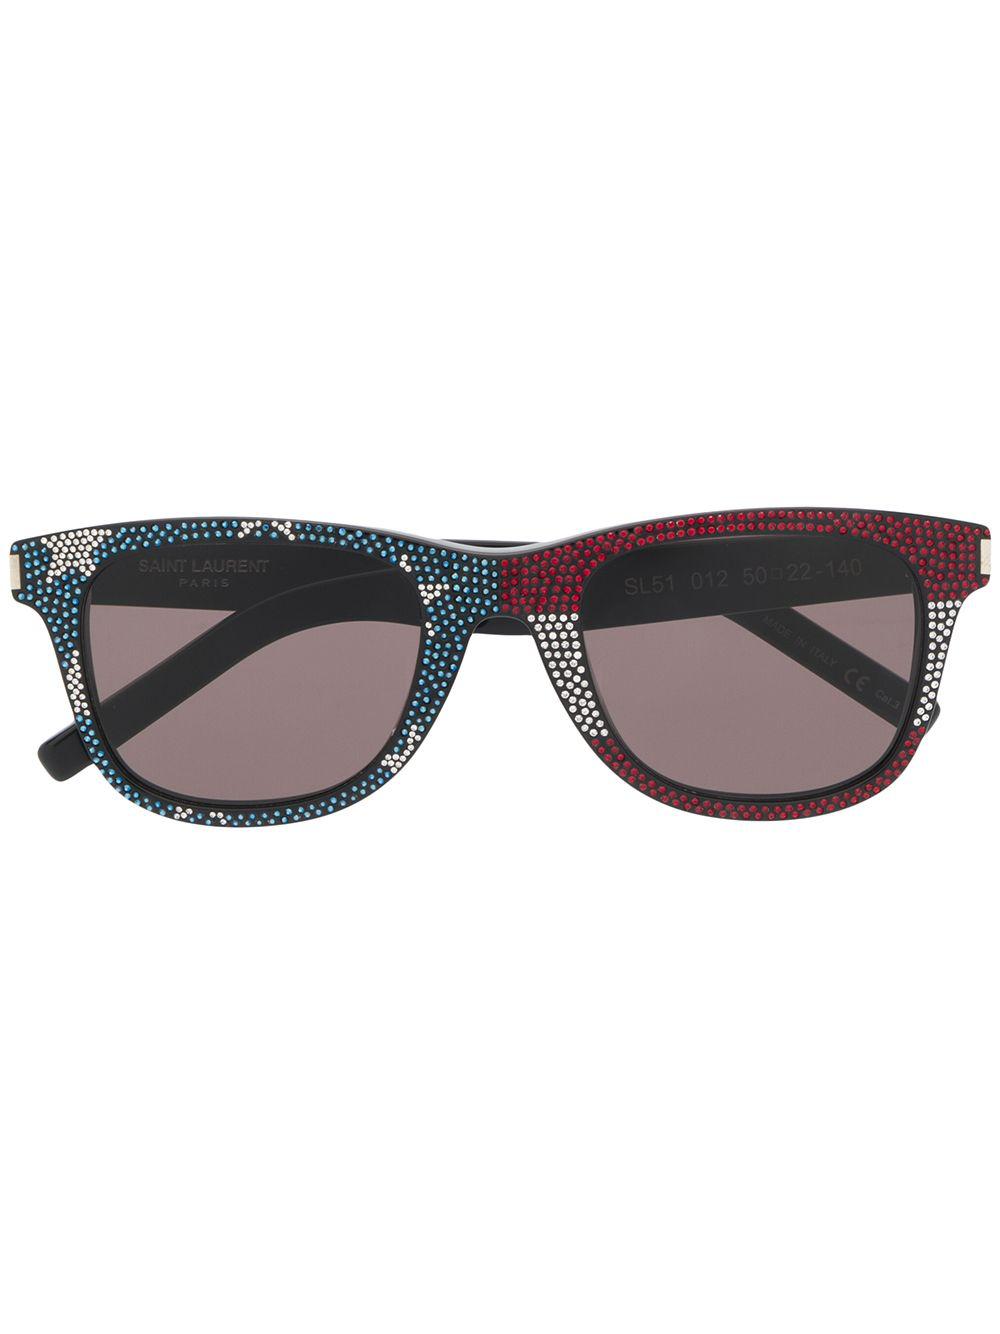 2c00917b1fbb Saint Laurent Eyewear Cl Sl 51 Us Sunglasses - Black | ModeSens